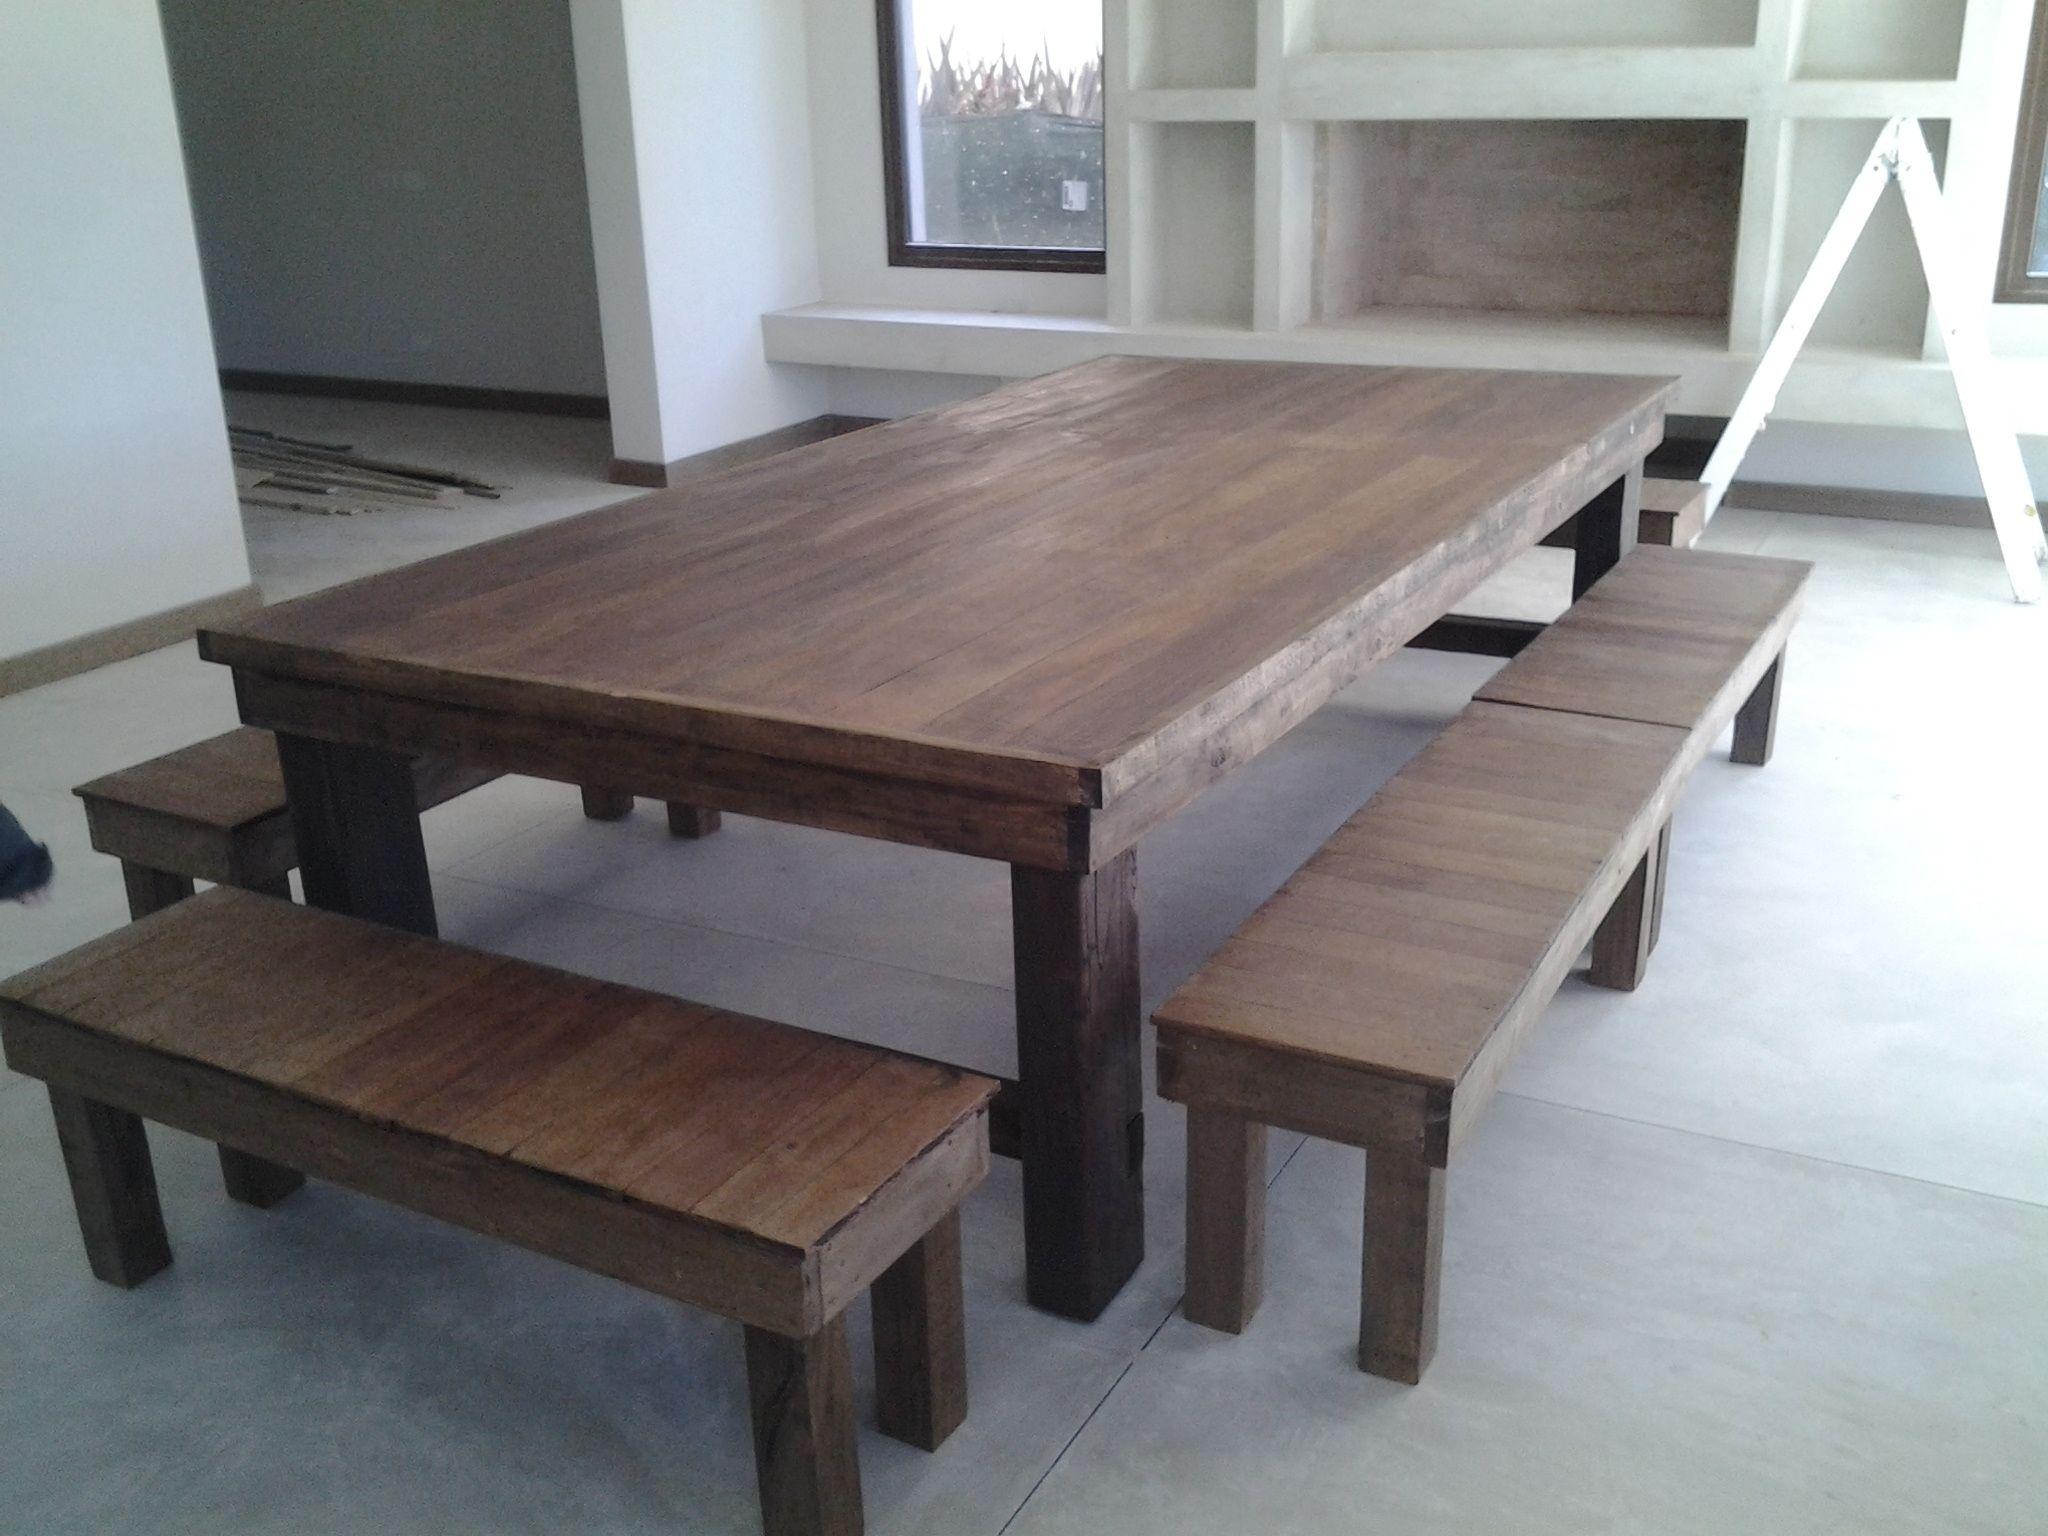 Mesa de madera dura reciclada mesas pinterest wood - Mesas madera reciclada ...